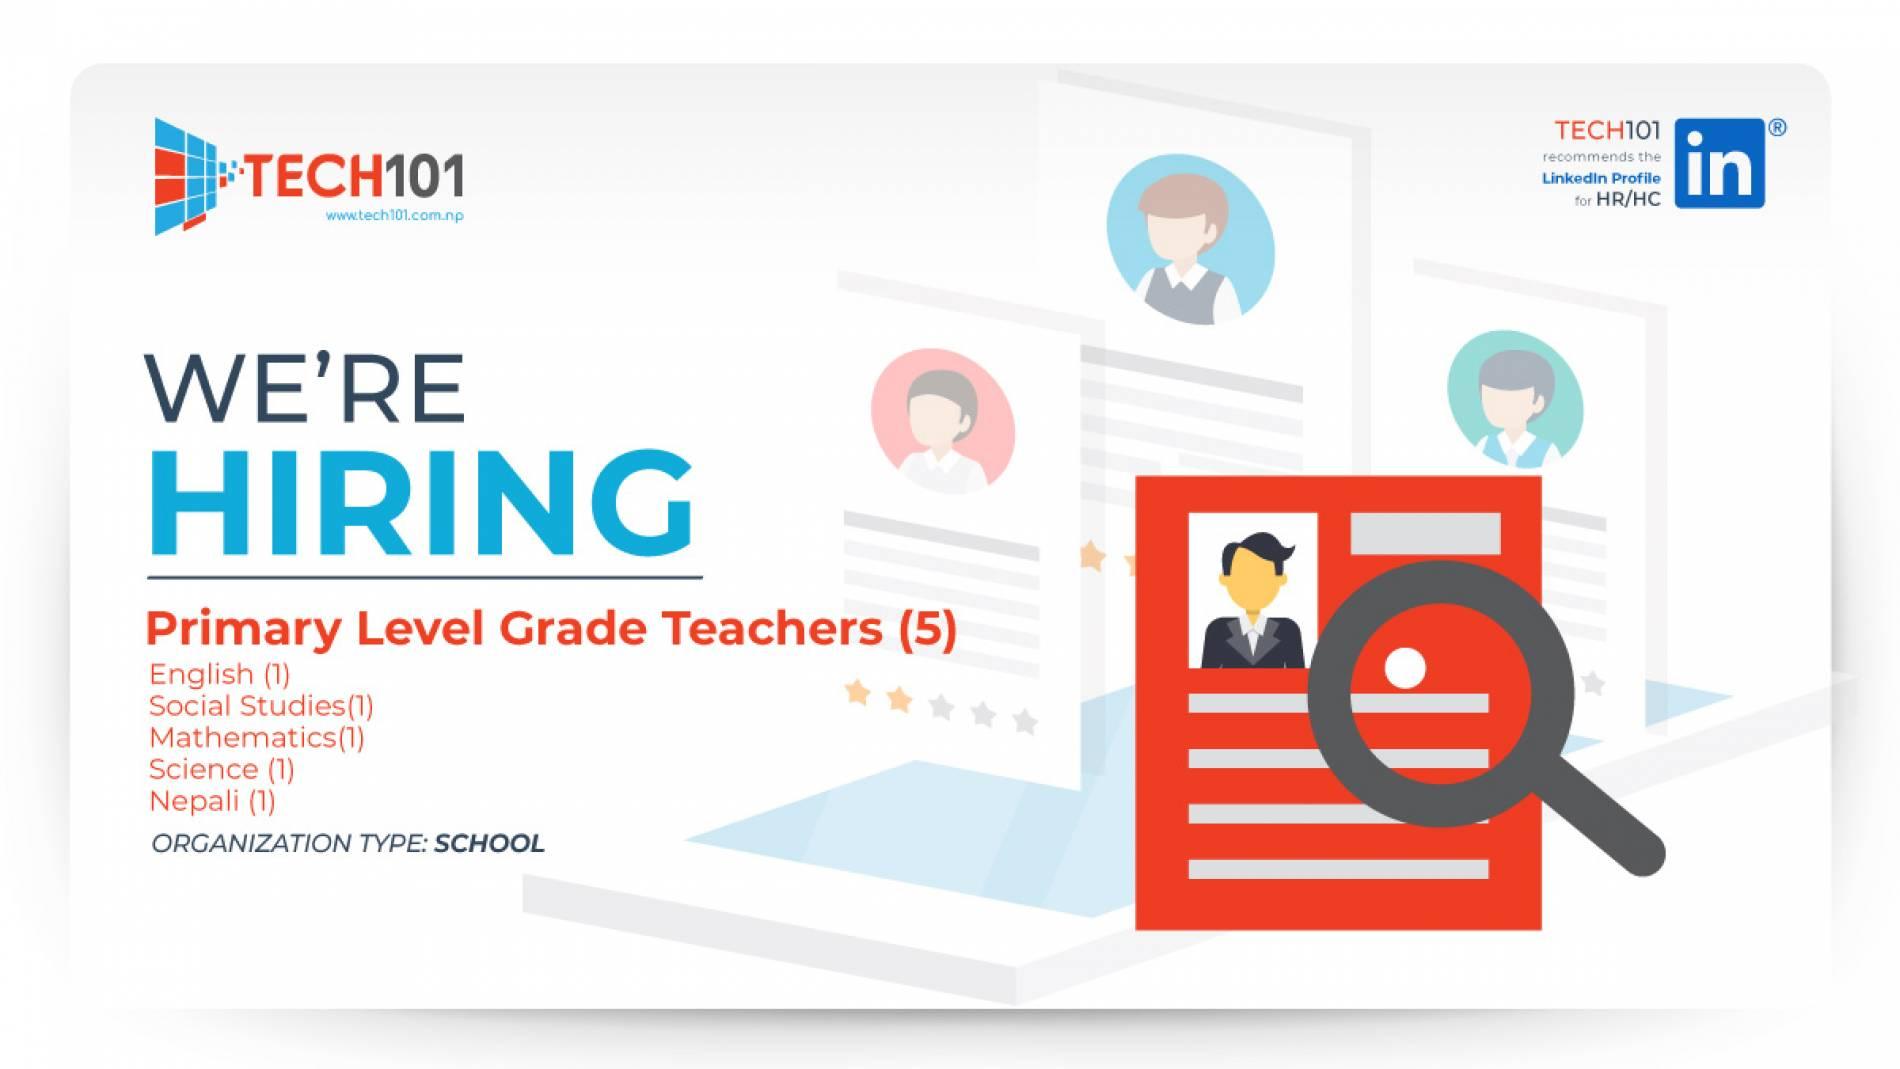 "Primary Level Grade Teachers (5)""English (1) Social Studies(1) Mathematics(1) Science (1) Nepali (1)"""